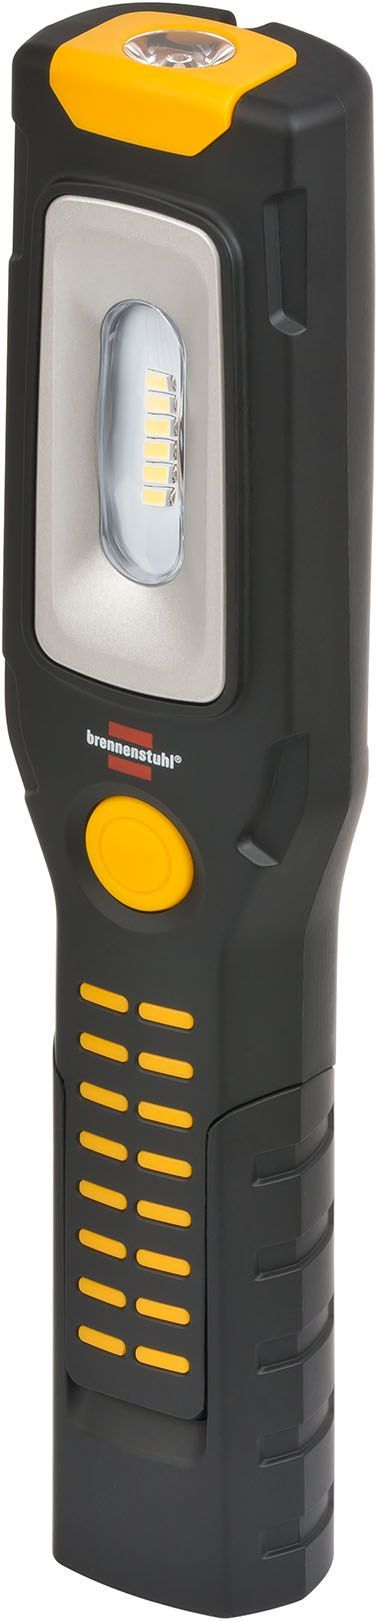 Brennenstuhl Wielofunkcyjna lampa akumulatorowa 6+1 LED HL2 DA 61 M3H2 (1175670) 1